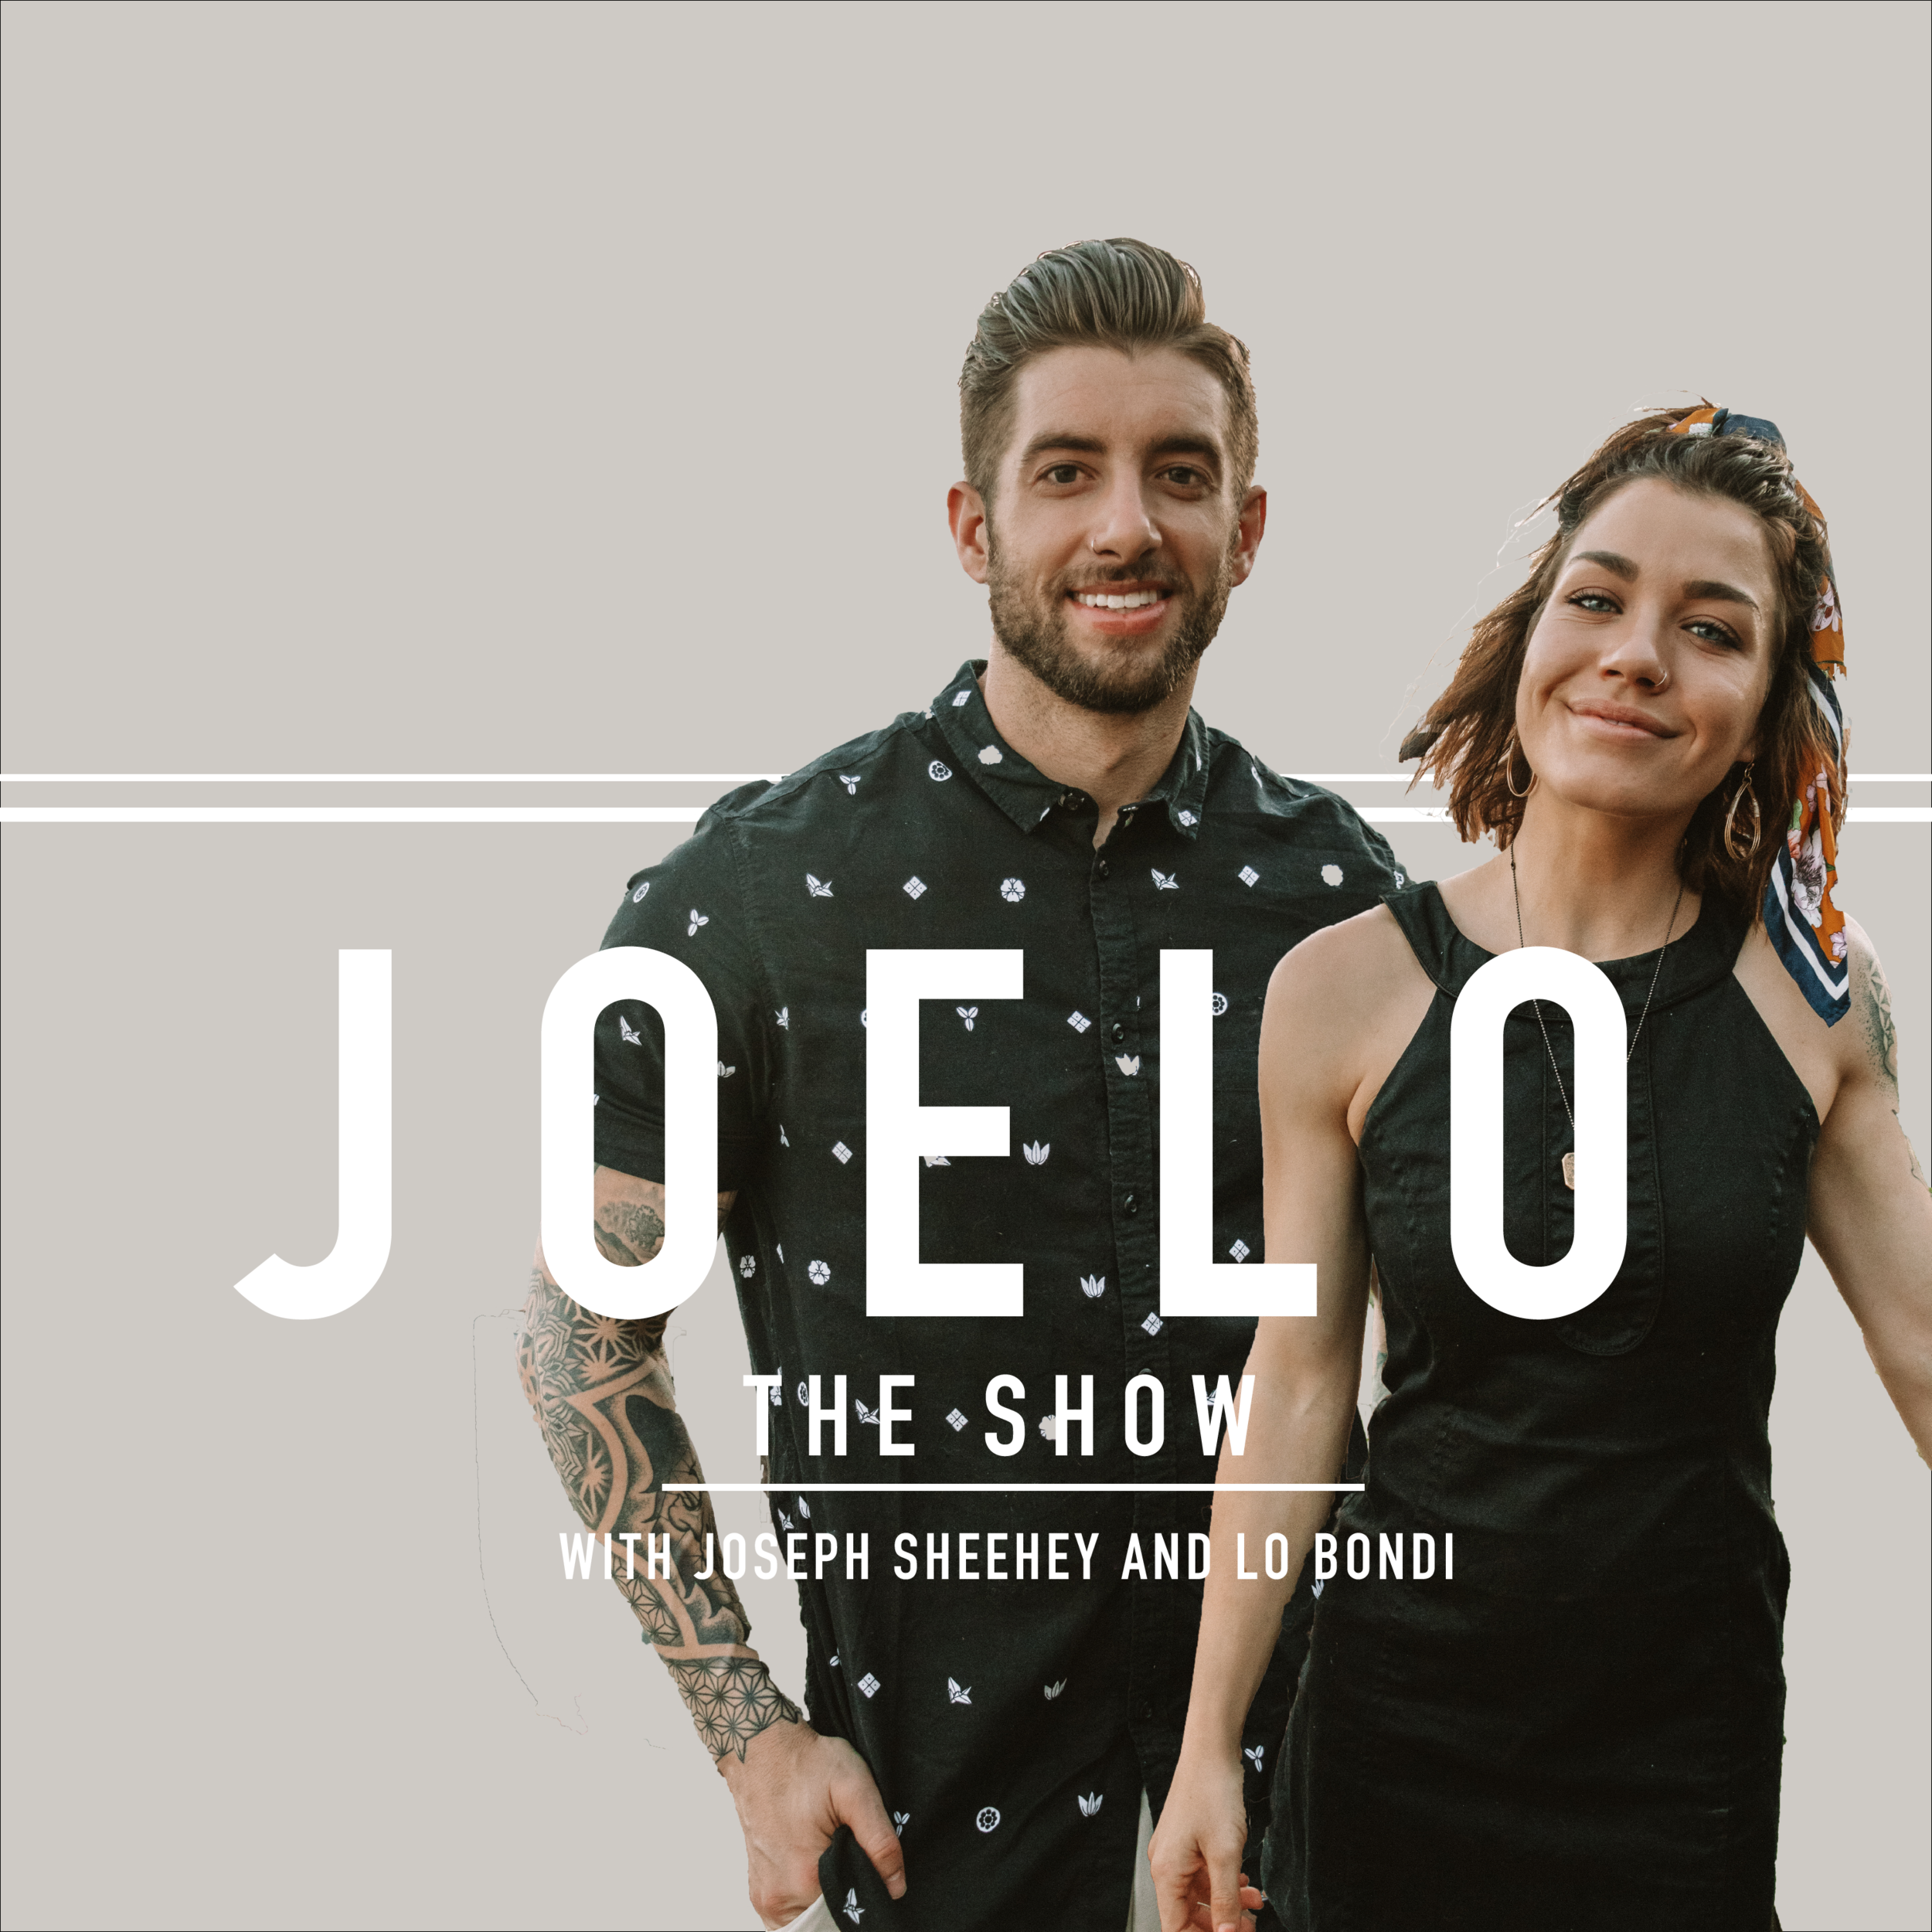 THE JOELO